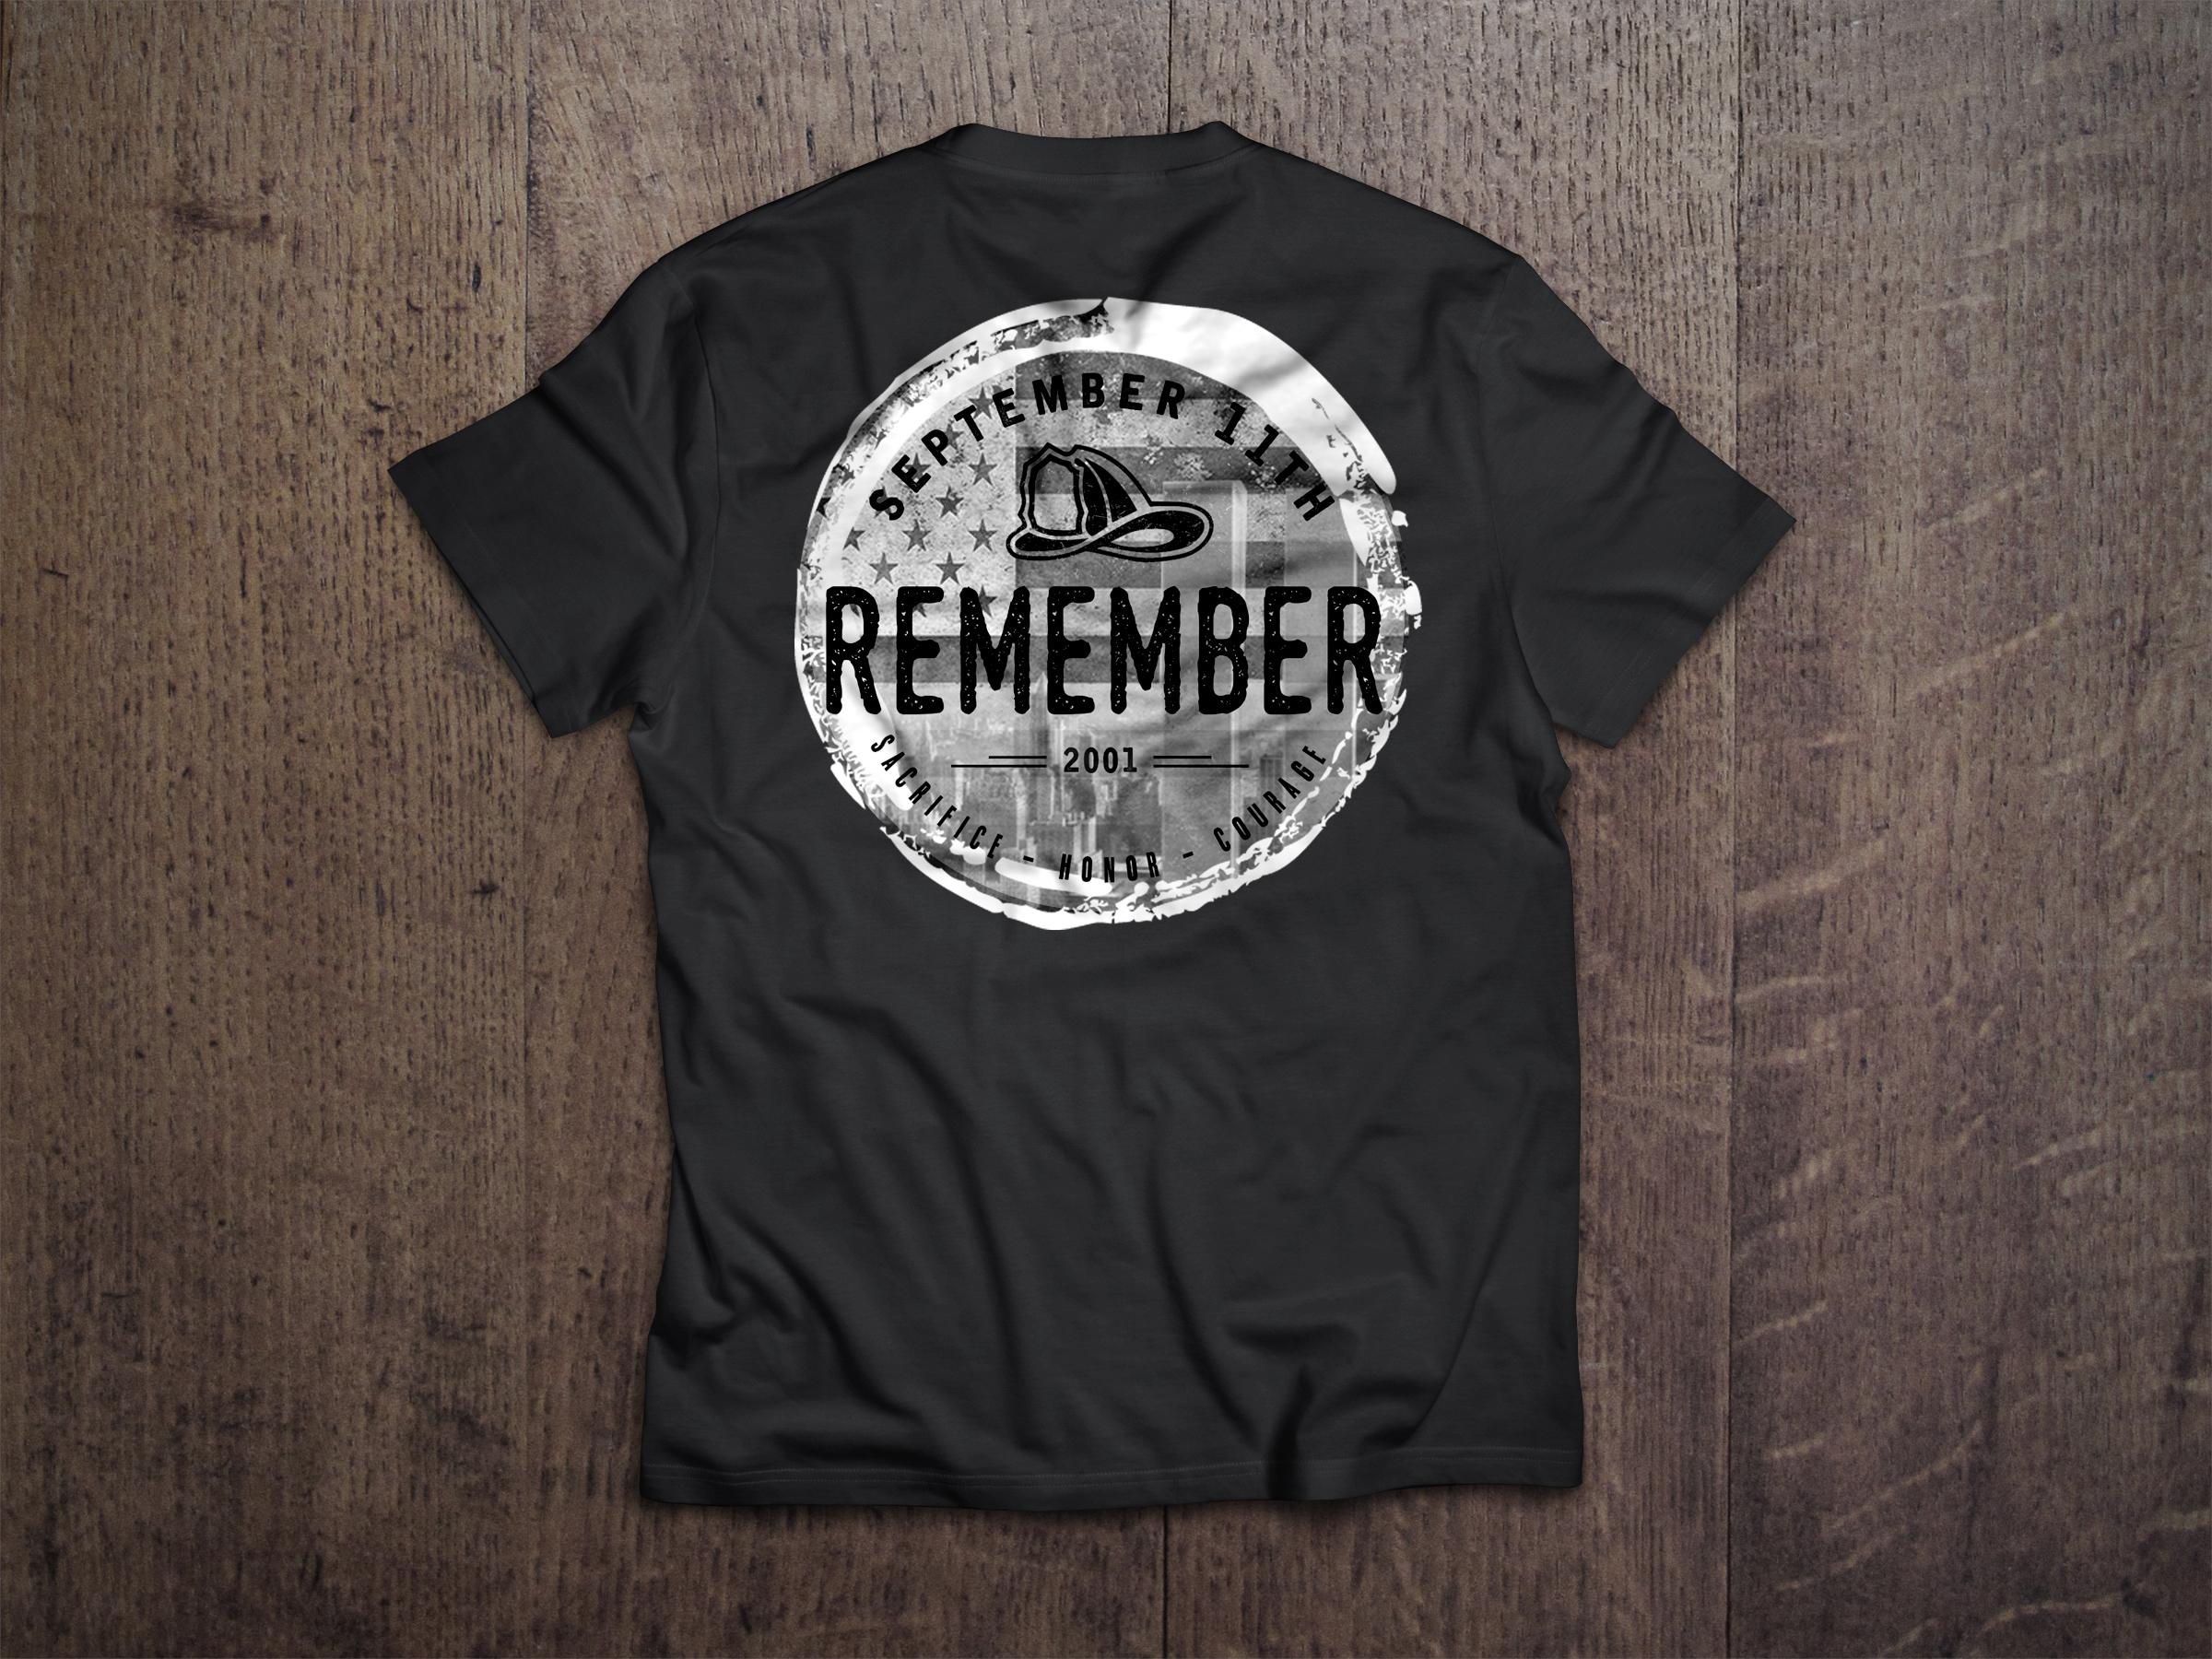 T-Shirt MockUp_Back_Black.jpg